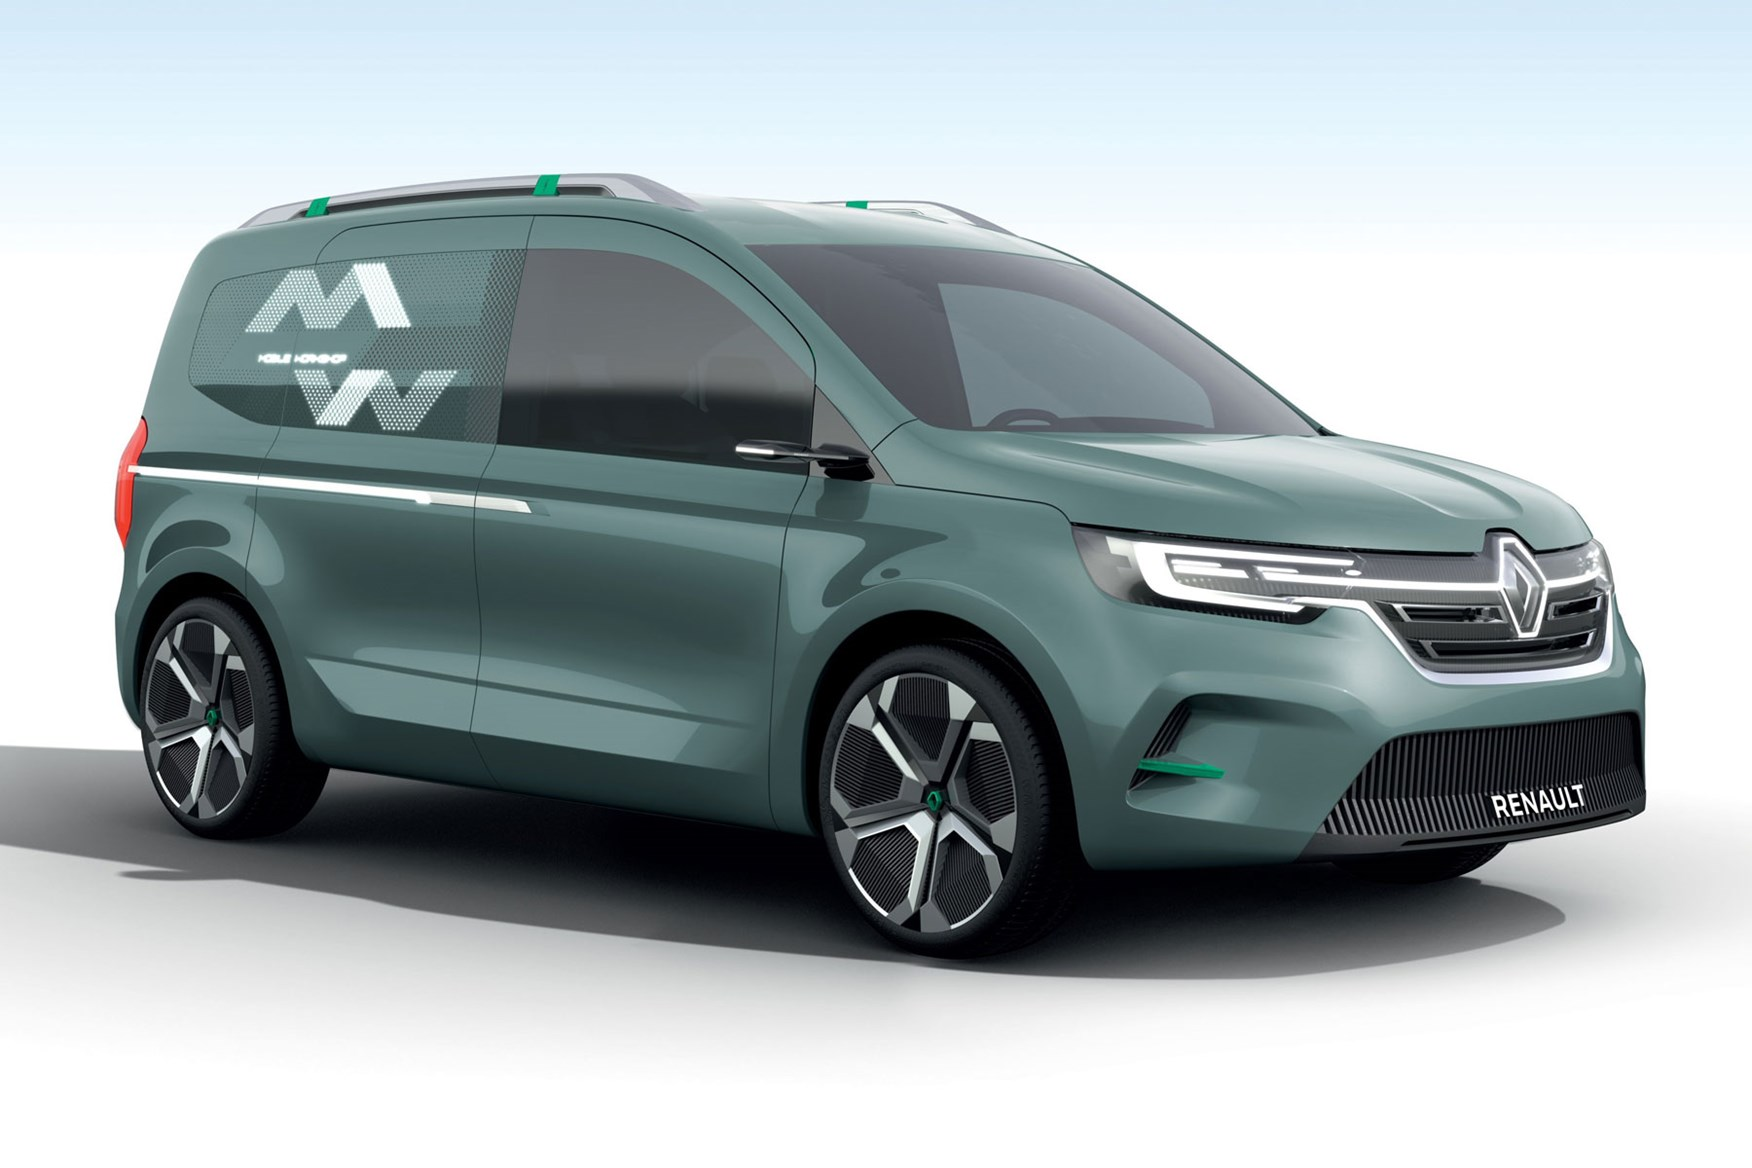 Renault Kangoo ZE concept for 2020-2021